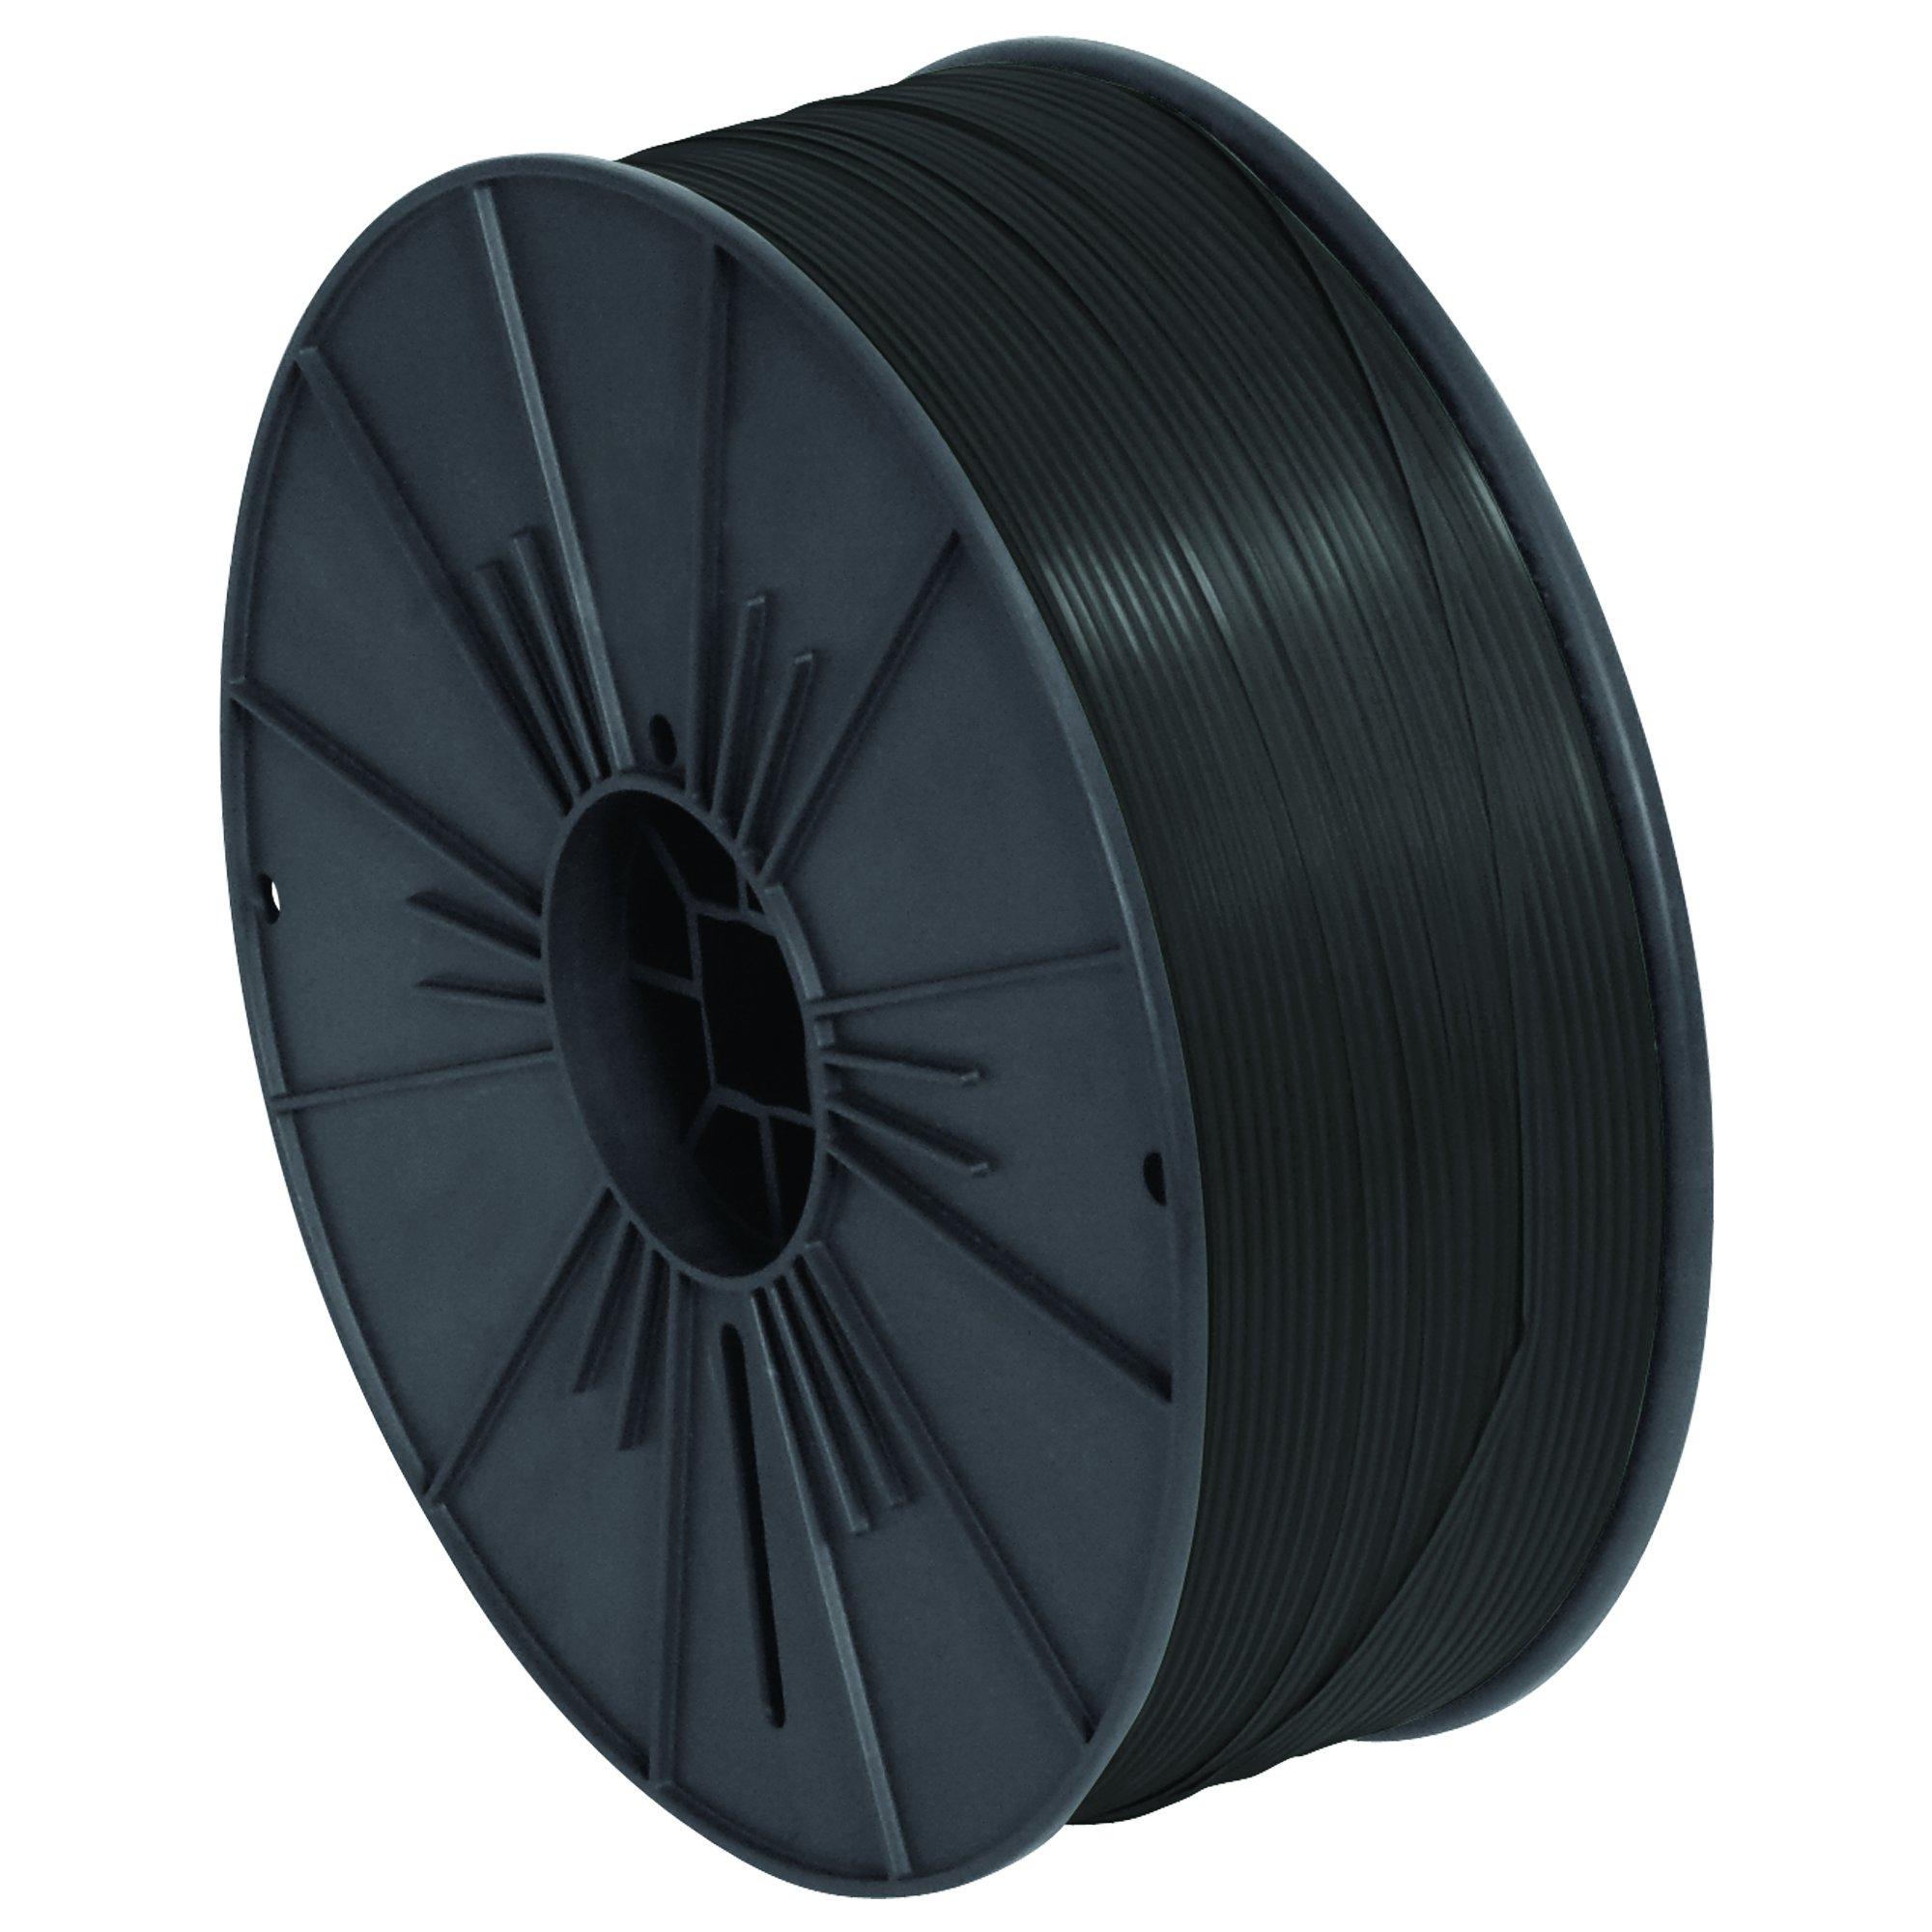 Ship Now Supply SNPLTS532K Plastic Twist Tie Spool, 5/32'' x 7000', 0.156'' width, black